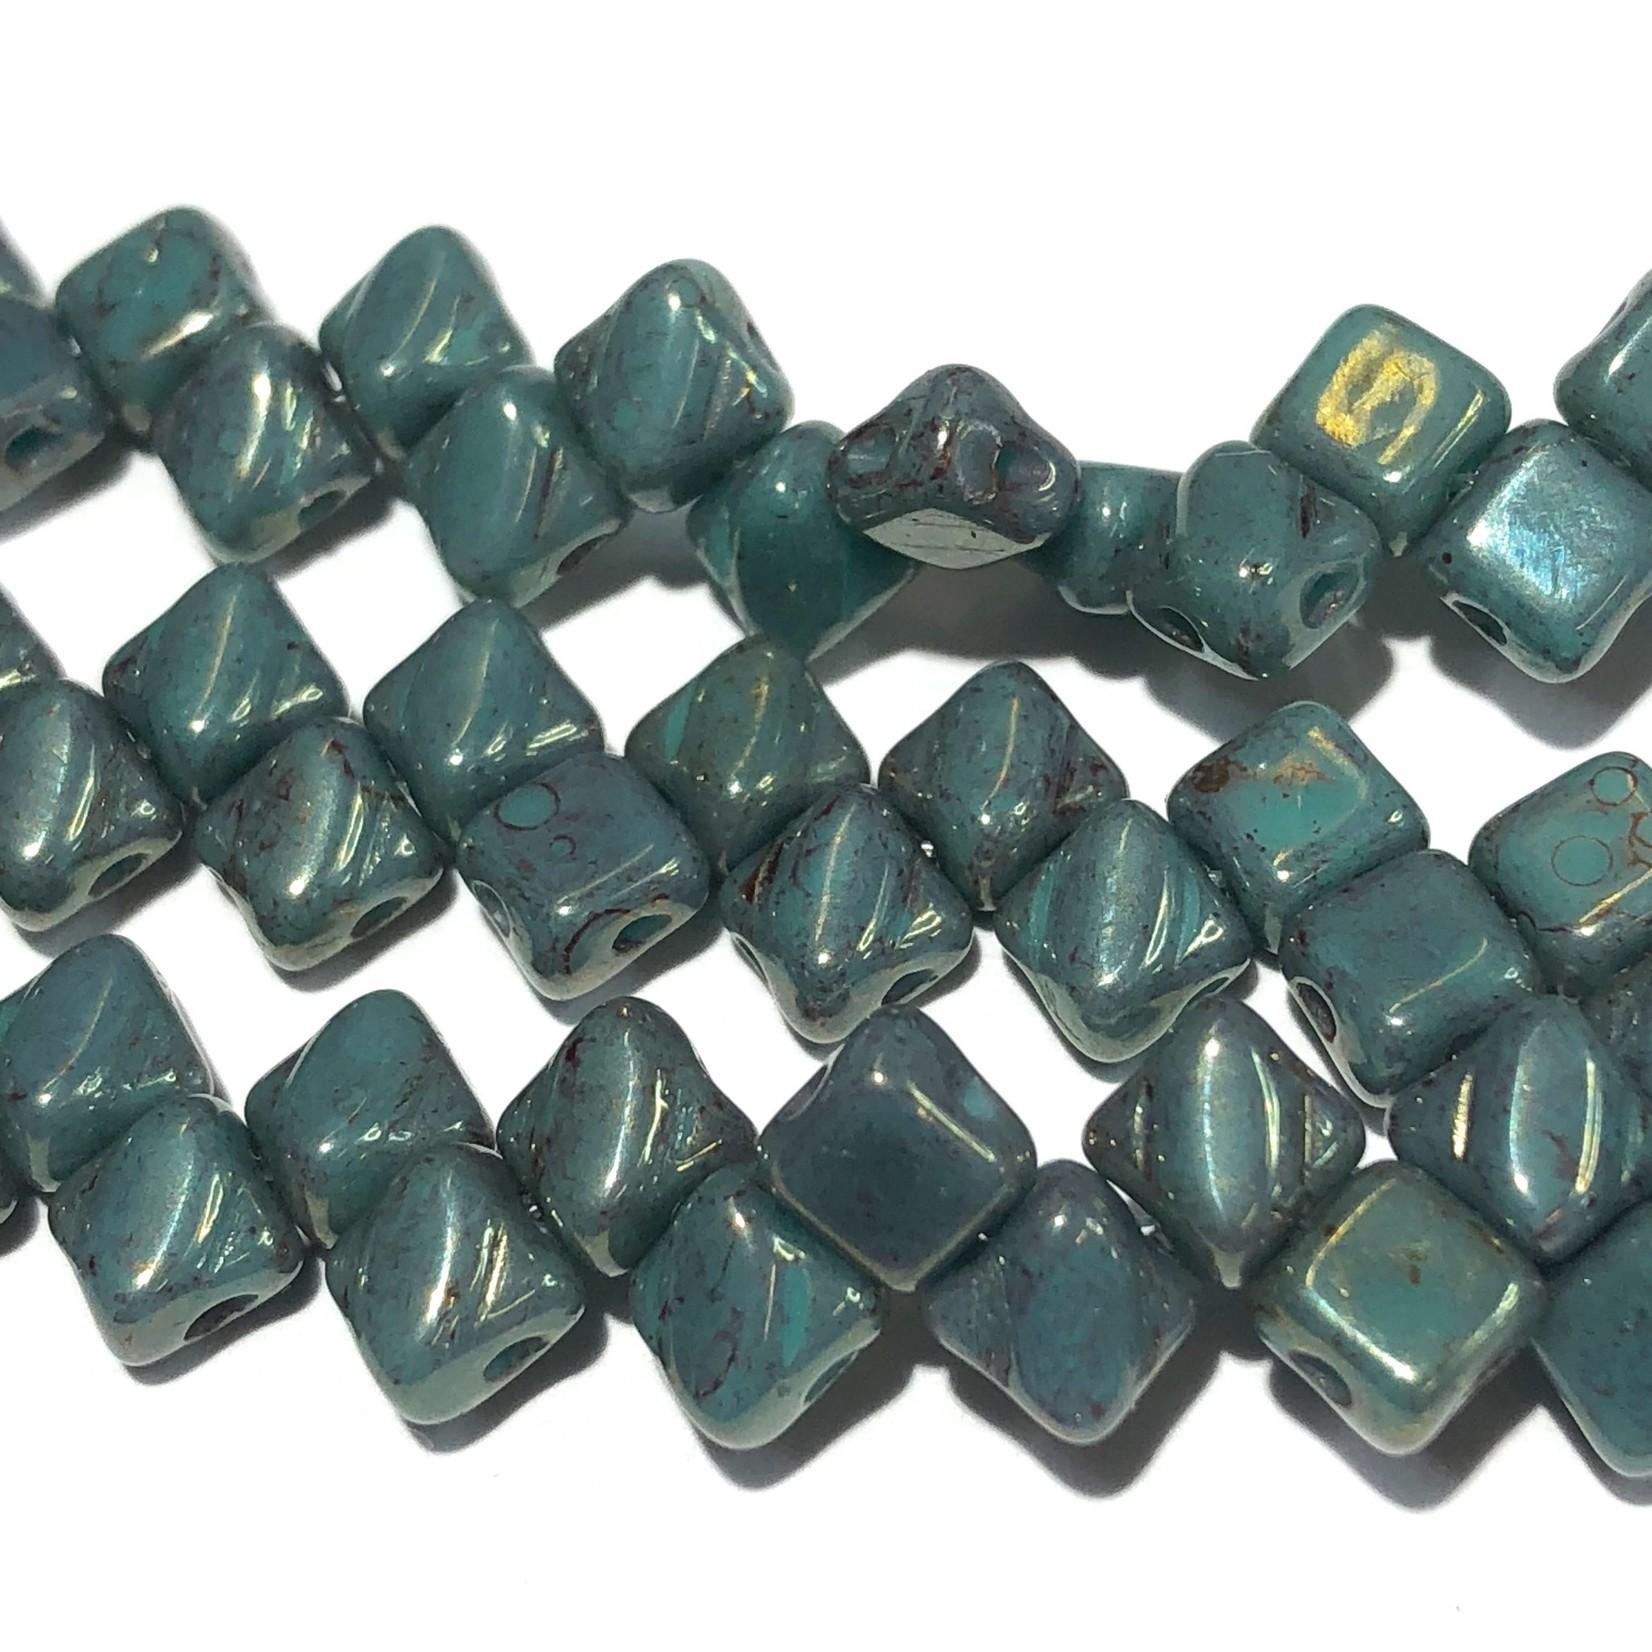 2-Hole SILKY Bead Green Turq Lumi 40pcs 5mm